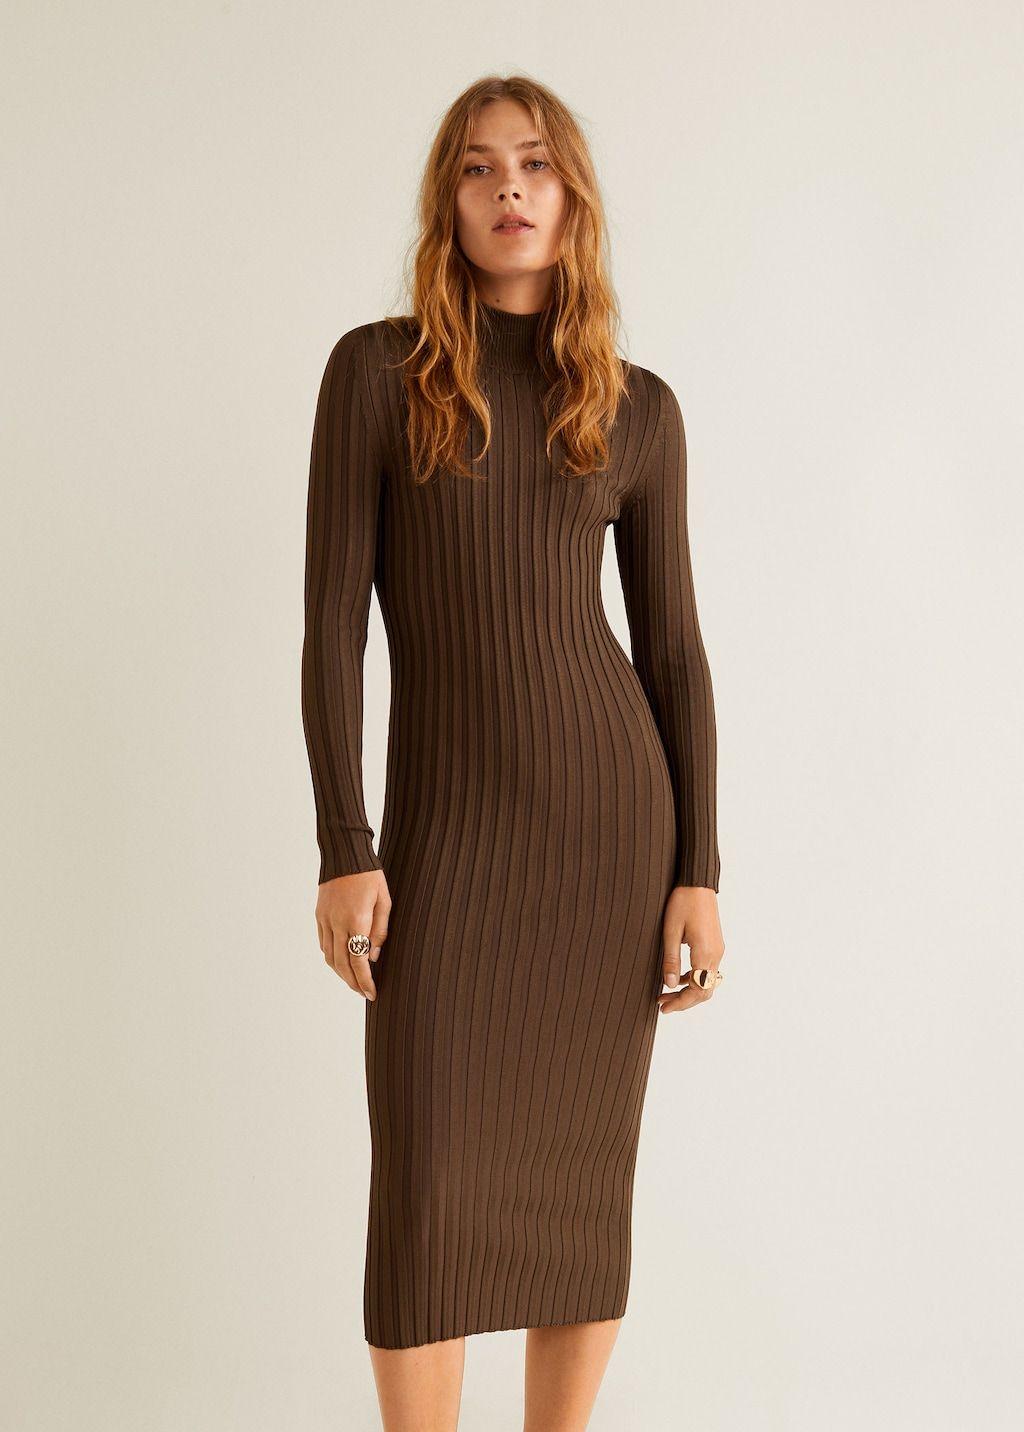 Turtle Neck Dress Women Mango Usa Turtle Neck Dress Brown Sweater Dress Long Sleeve Dress Winter